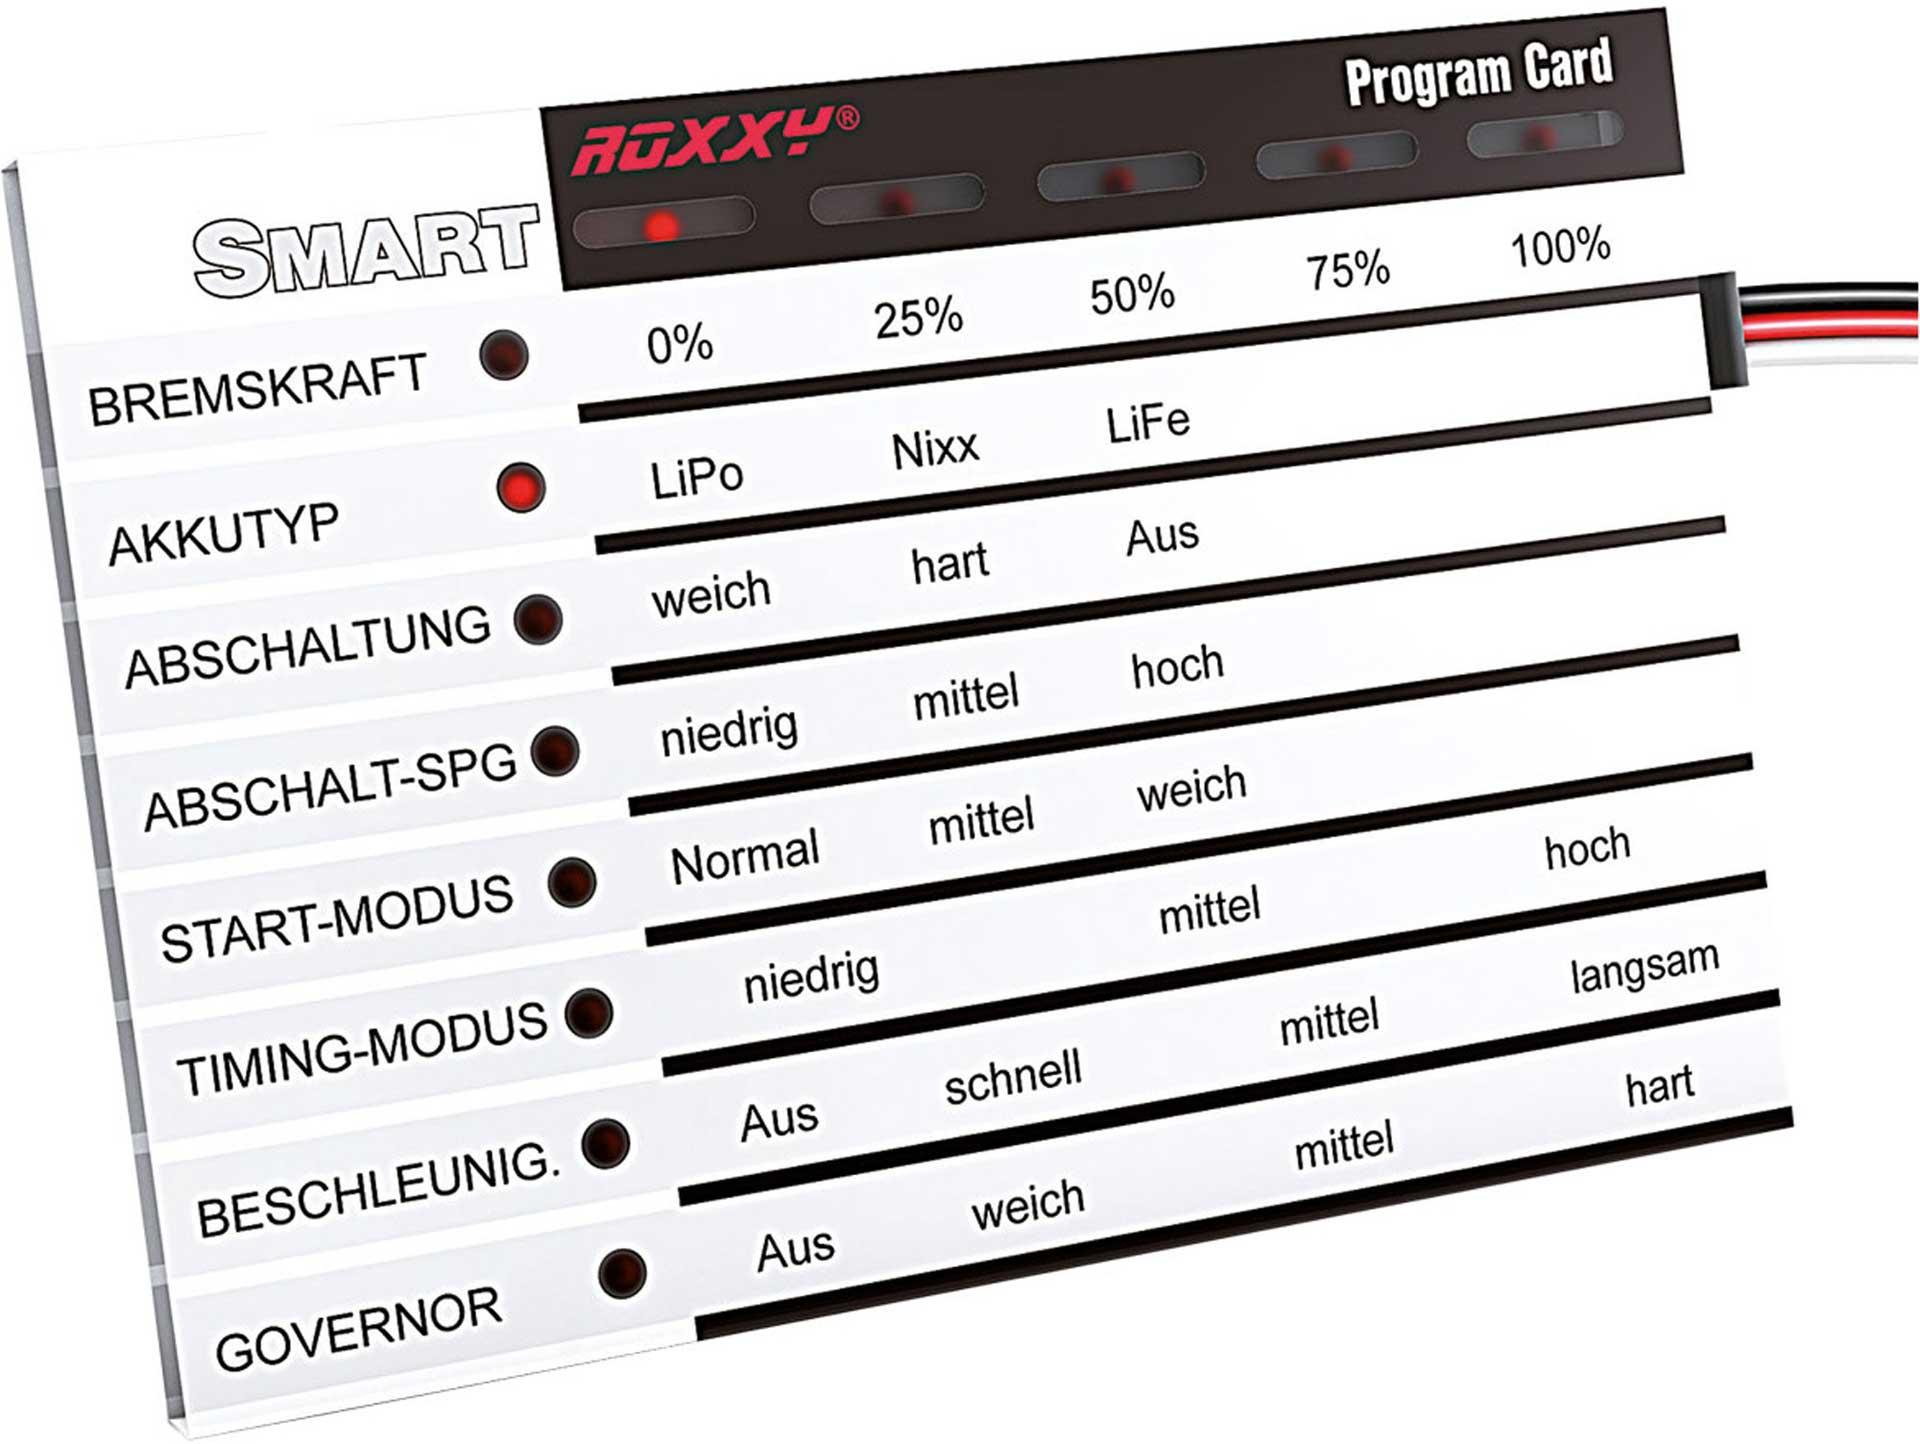 ROXXY SMART PROGRAM CARD ENGLISH FOR ROXXY SMART CONTROL ESC